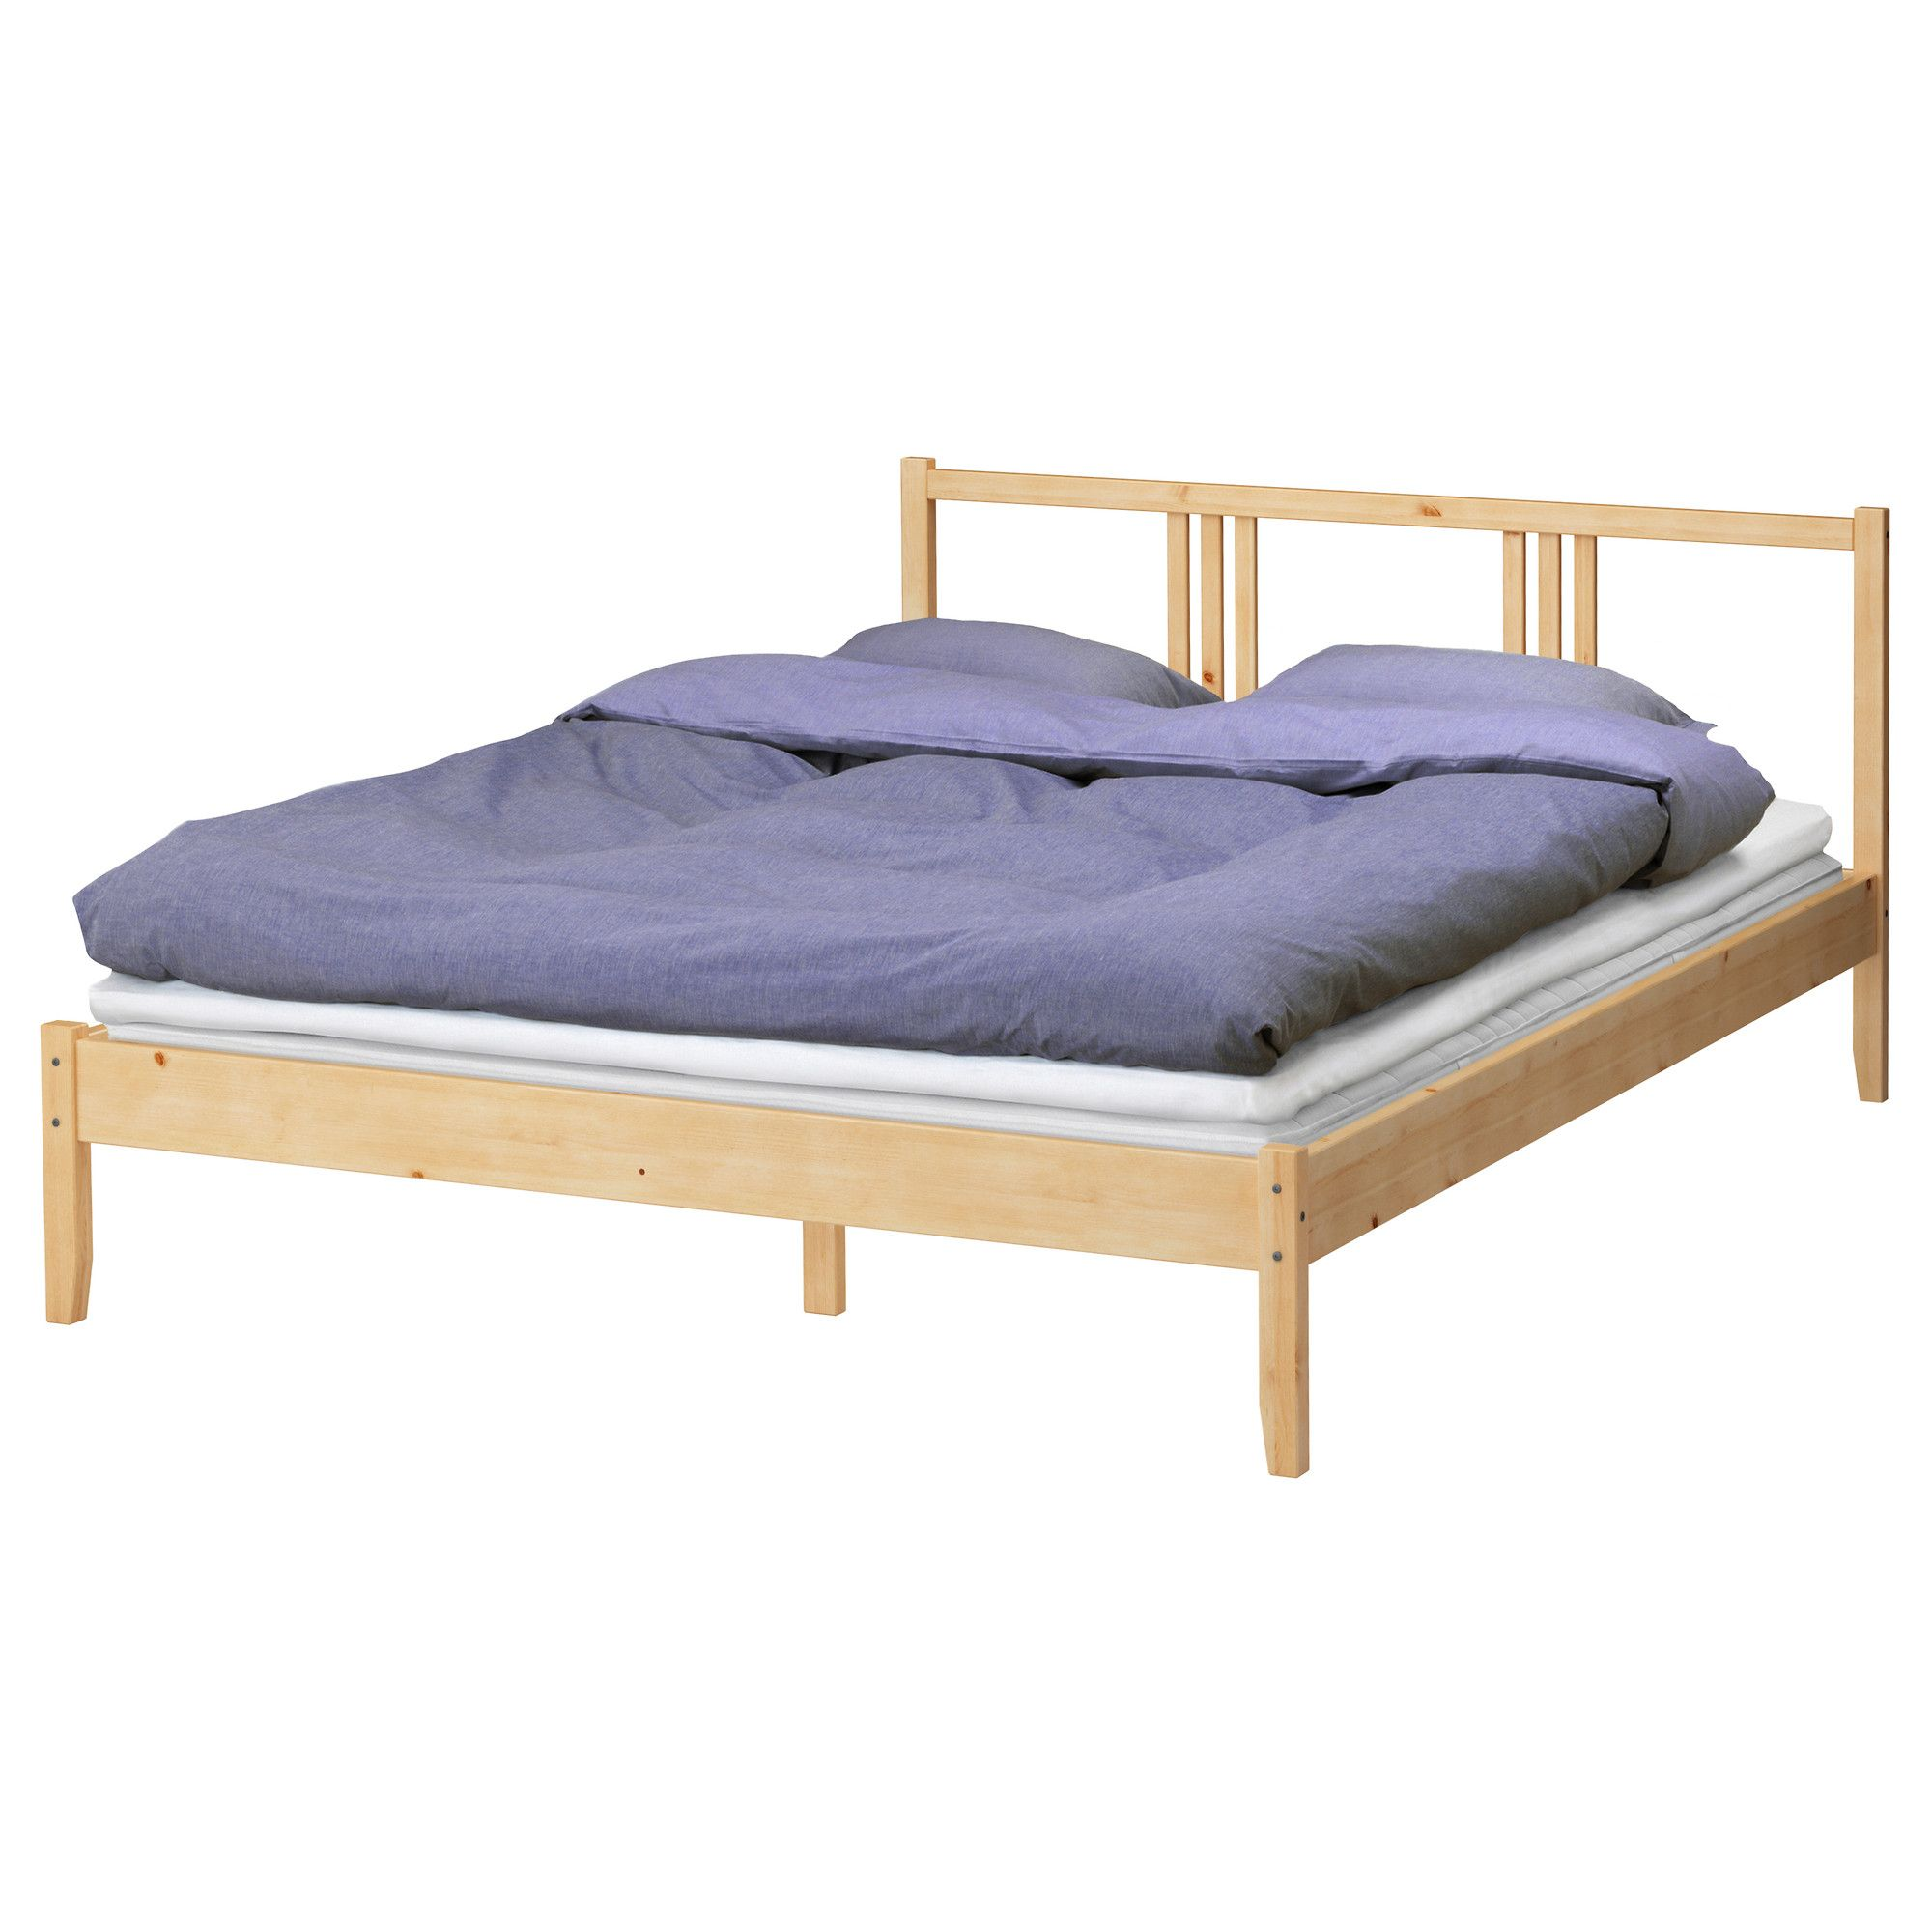 fjellse bed frame pine cheap bed frameswood - Cheap Wooden Bed Frames